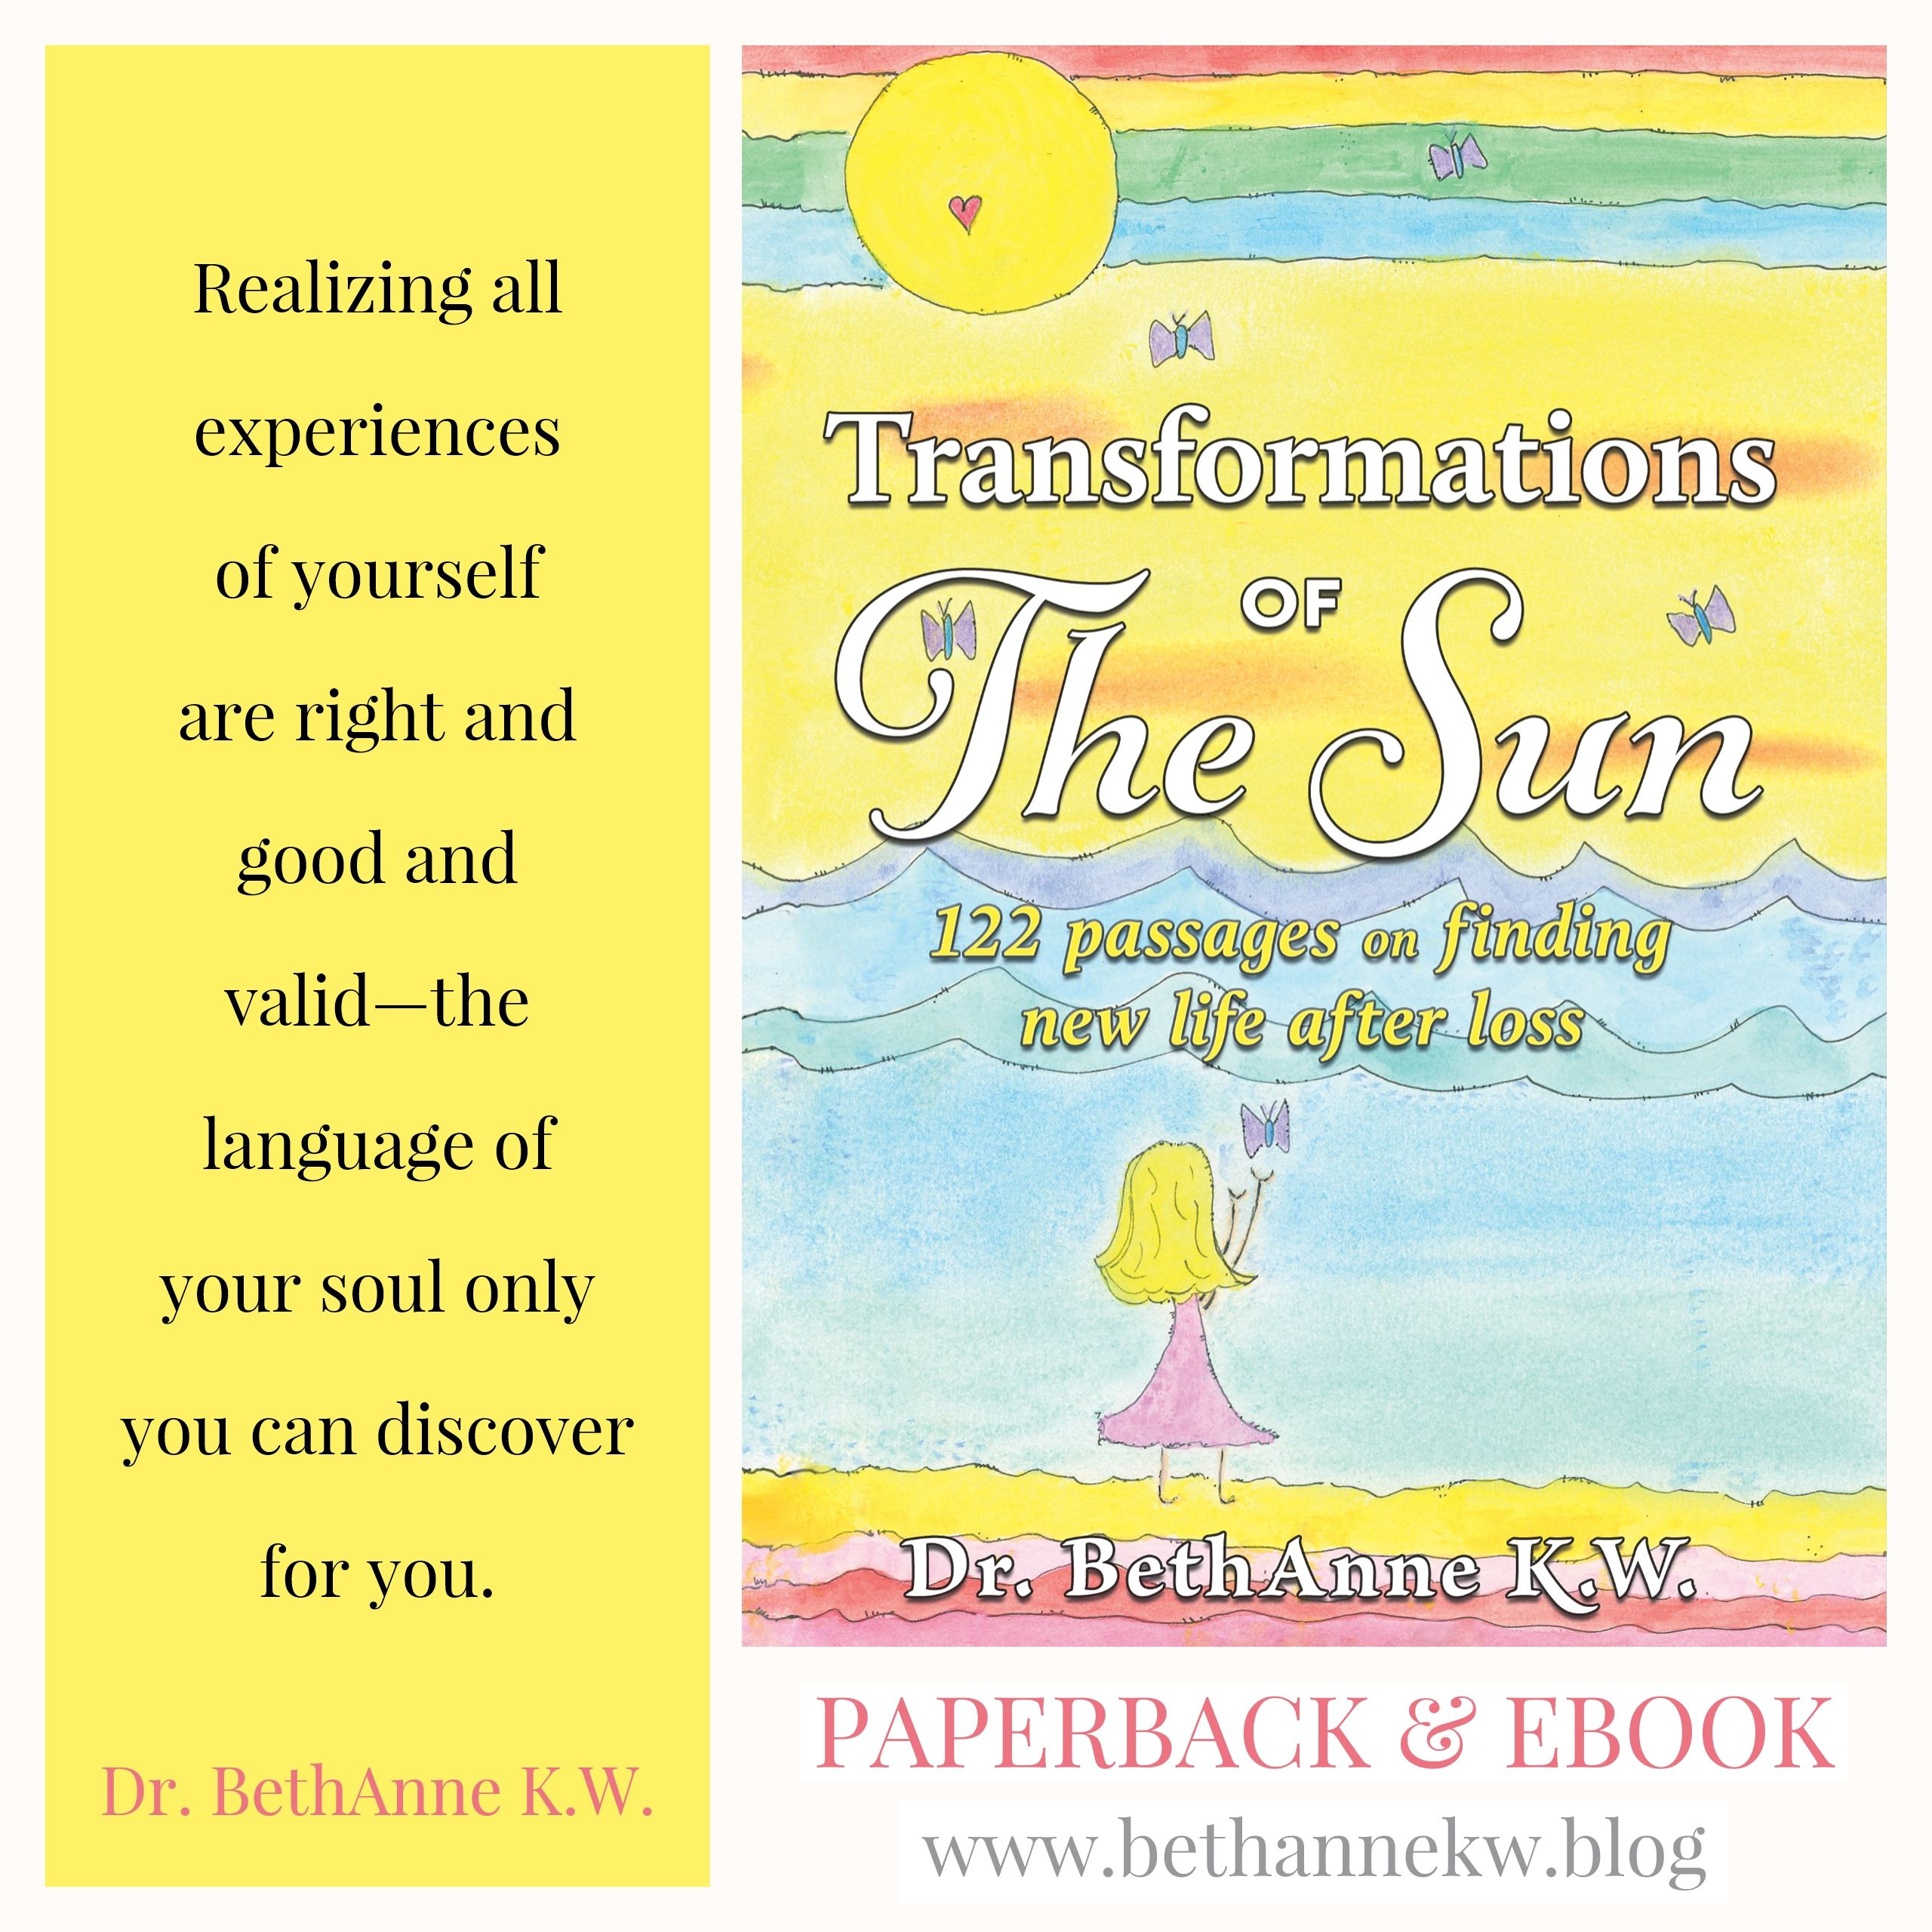 loss #bereavement #grief #transformation #book #motivational